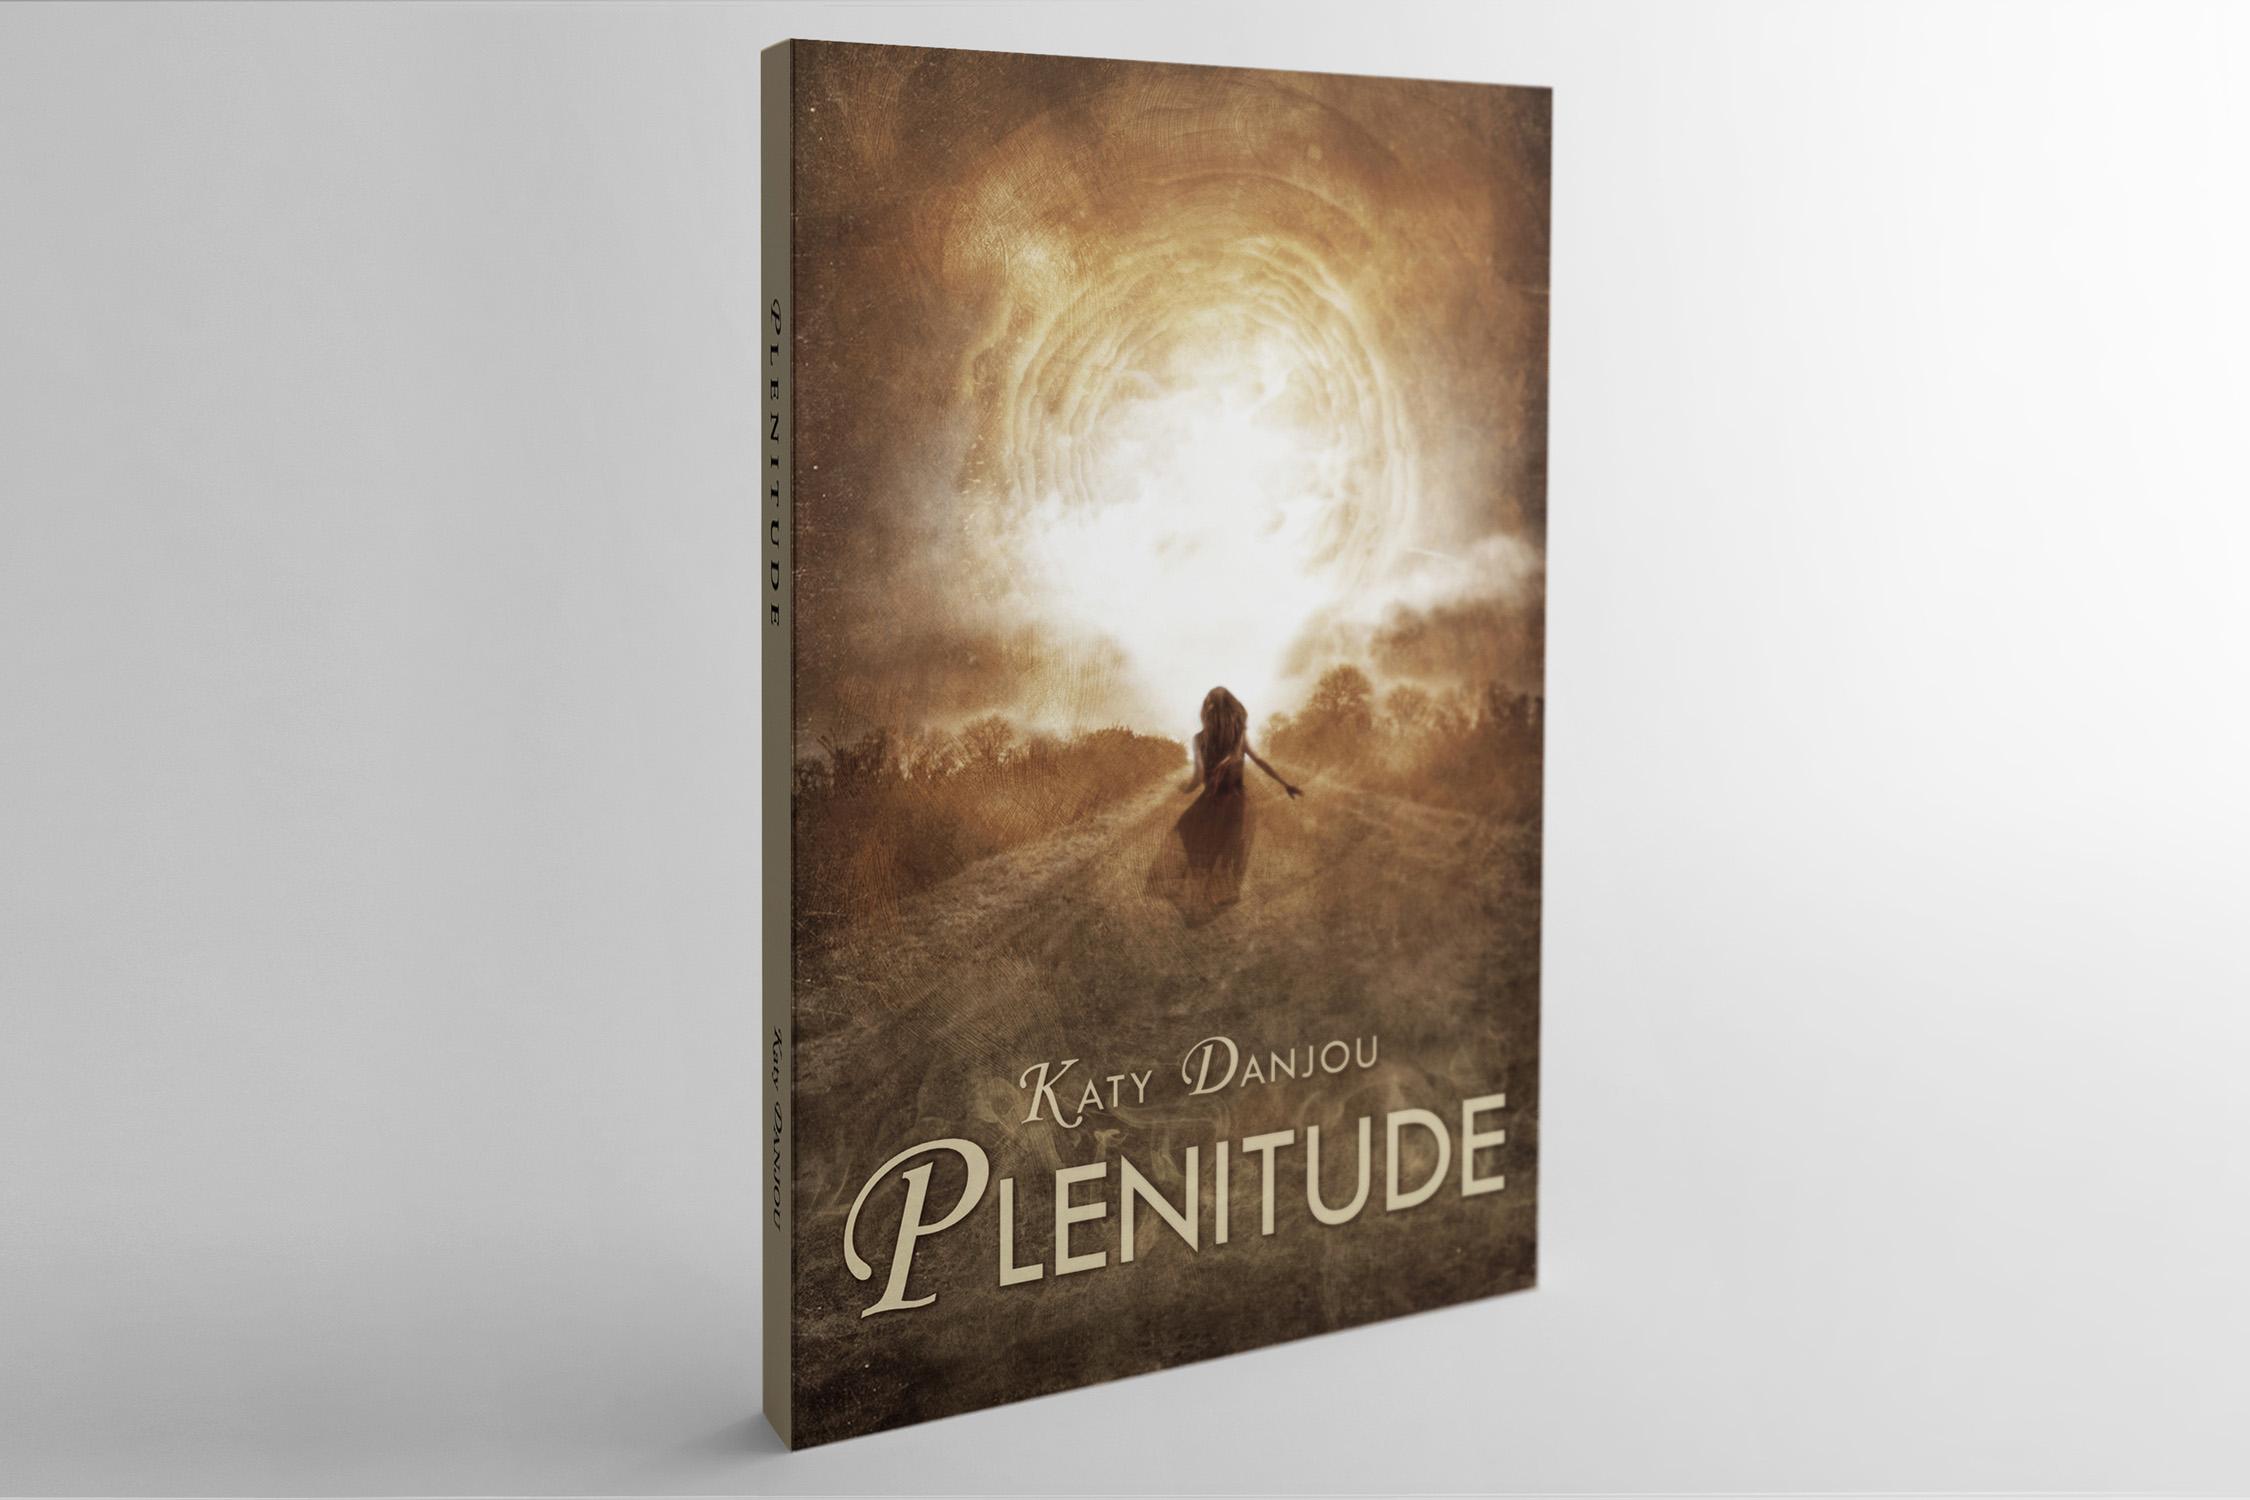 Plenitude by Katy Danjou - Cover Art